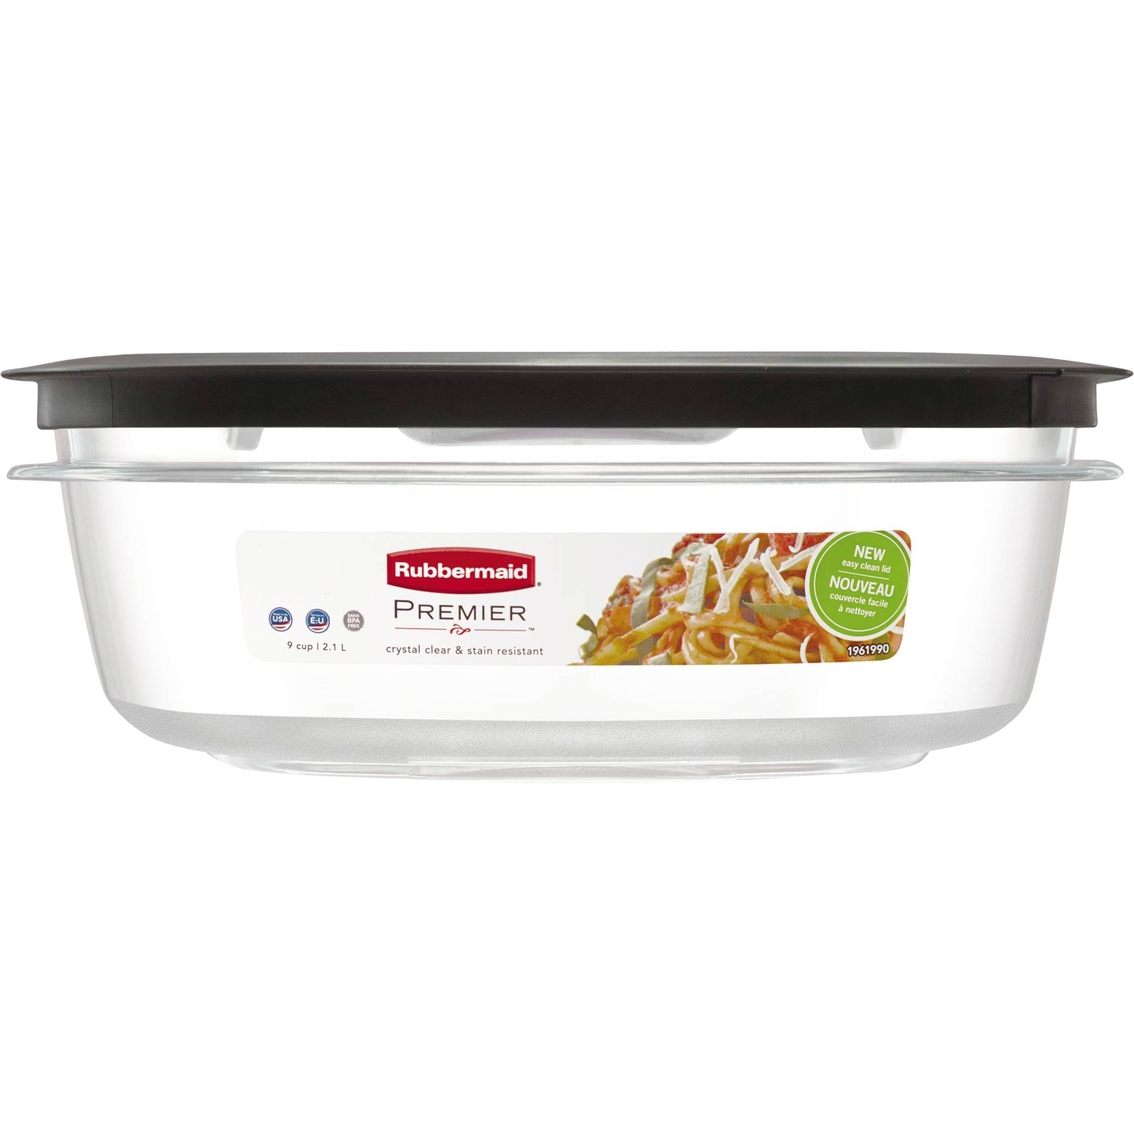 Rubbermaid Premier 9 Cup Food Storage Container Food Storage